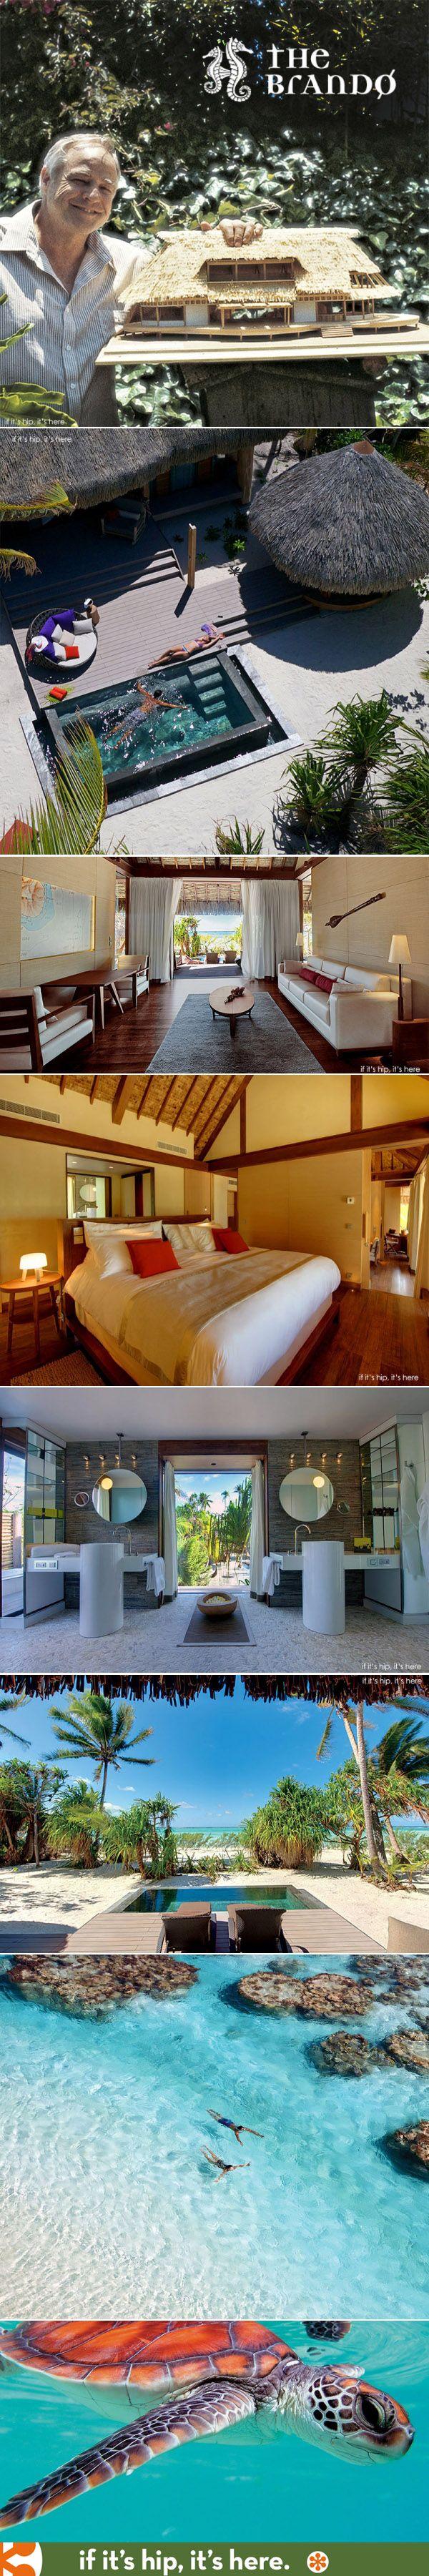 The Brando, Marlon's Eco-friendly Island Dream Resort, finally opens ten years after his death.